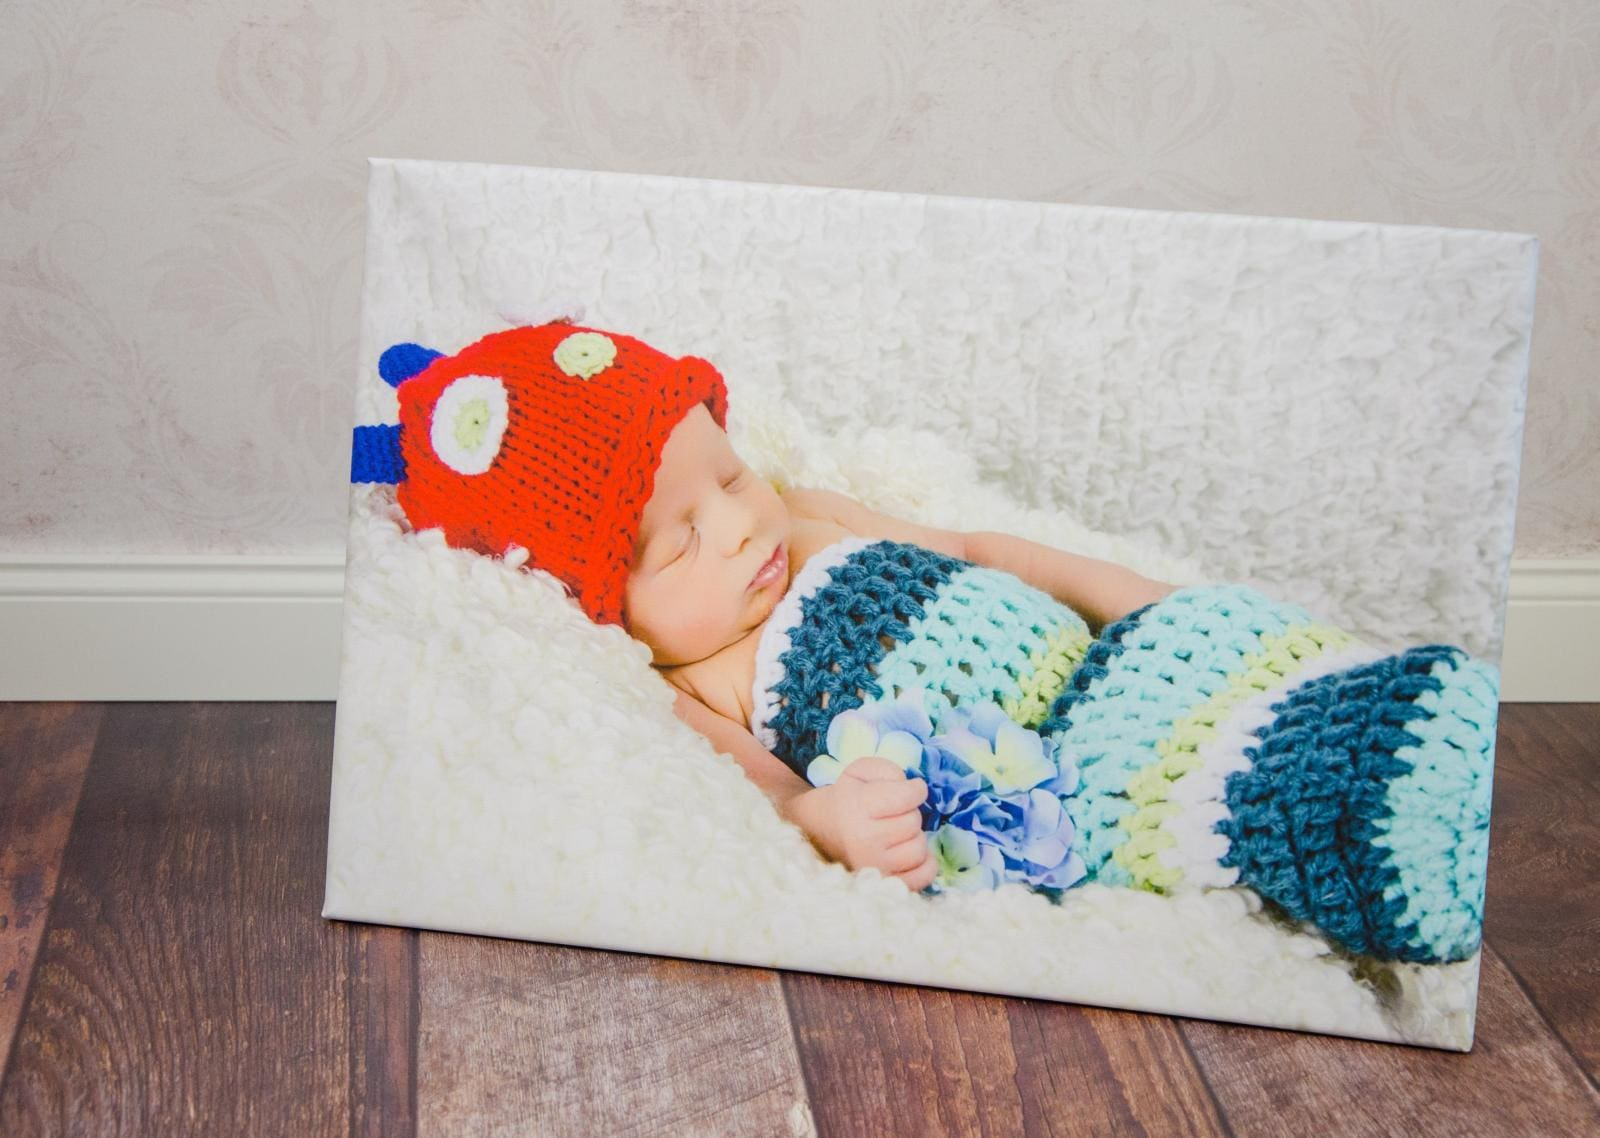 f r fotoliebhaber interior baby kind und meer. Black Bedroom Furniture Sets. Home Design Ideas